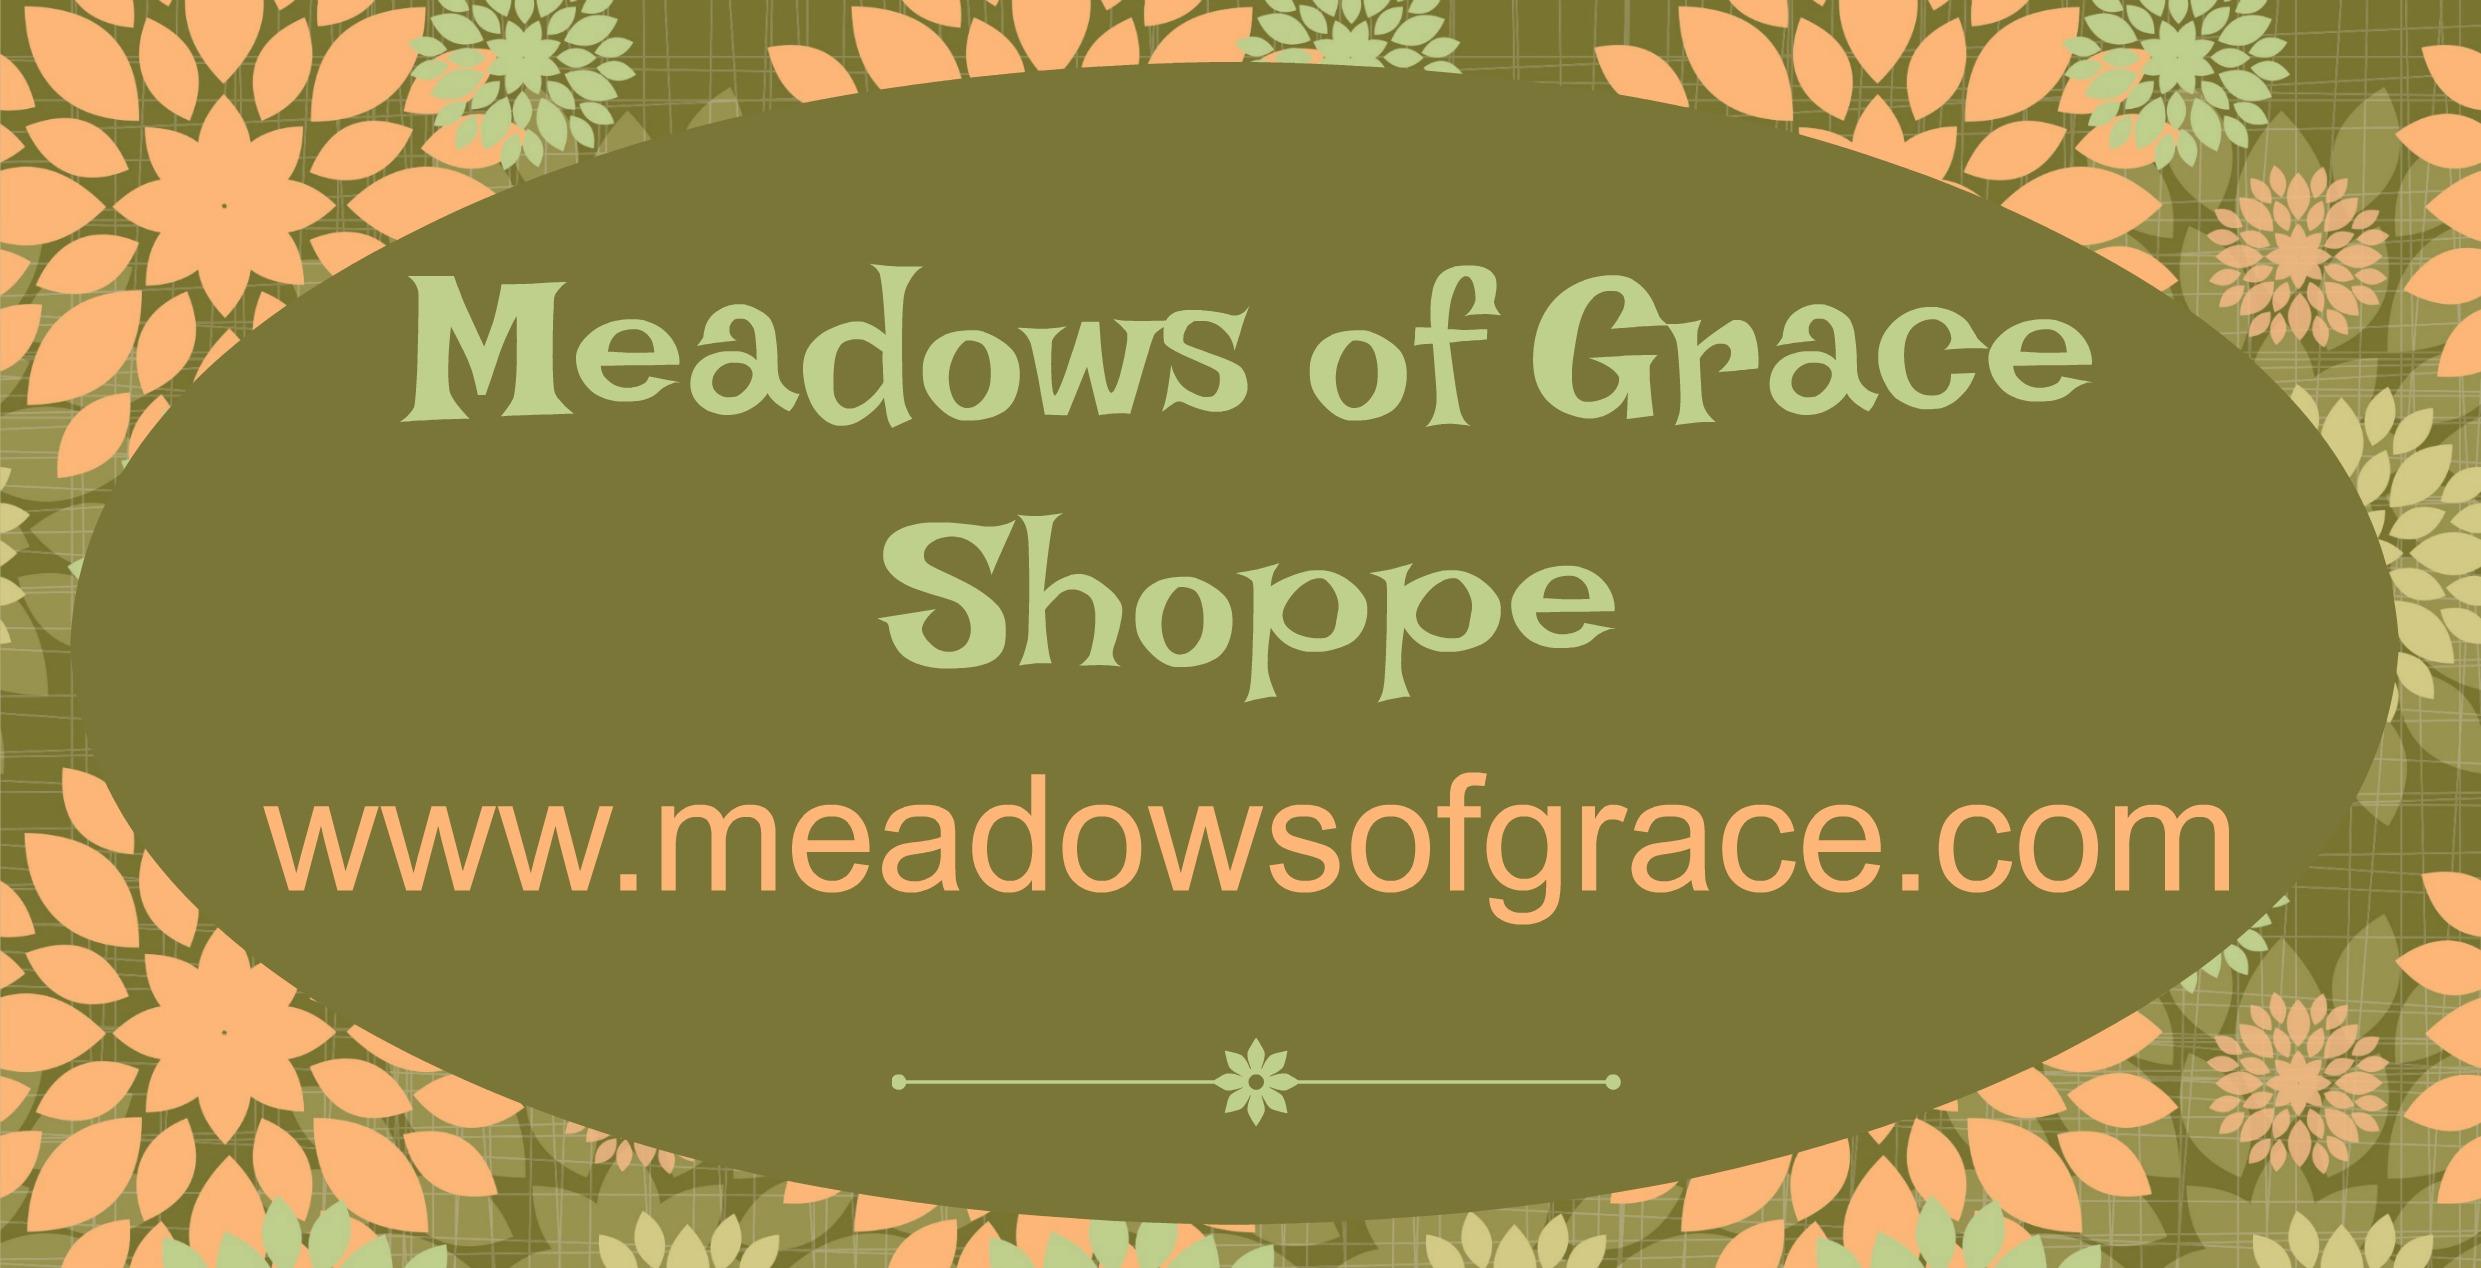 meadows of grace shoppe